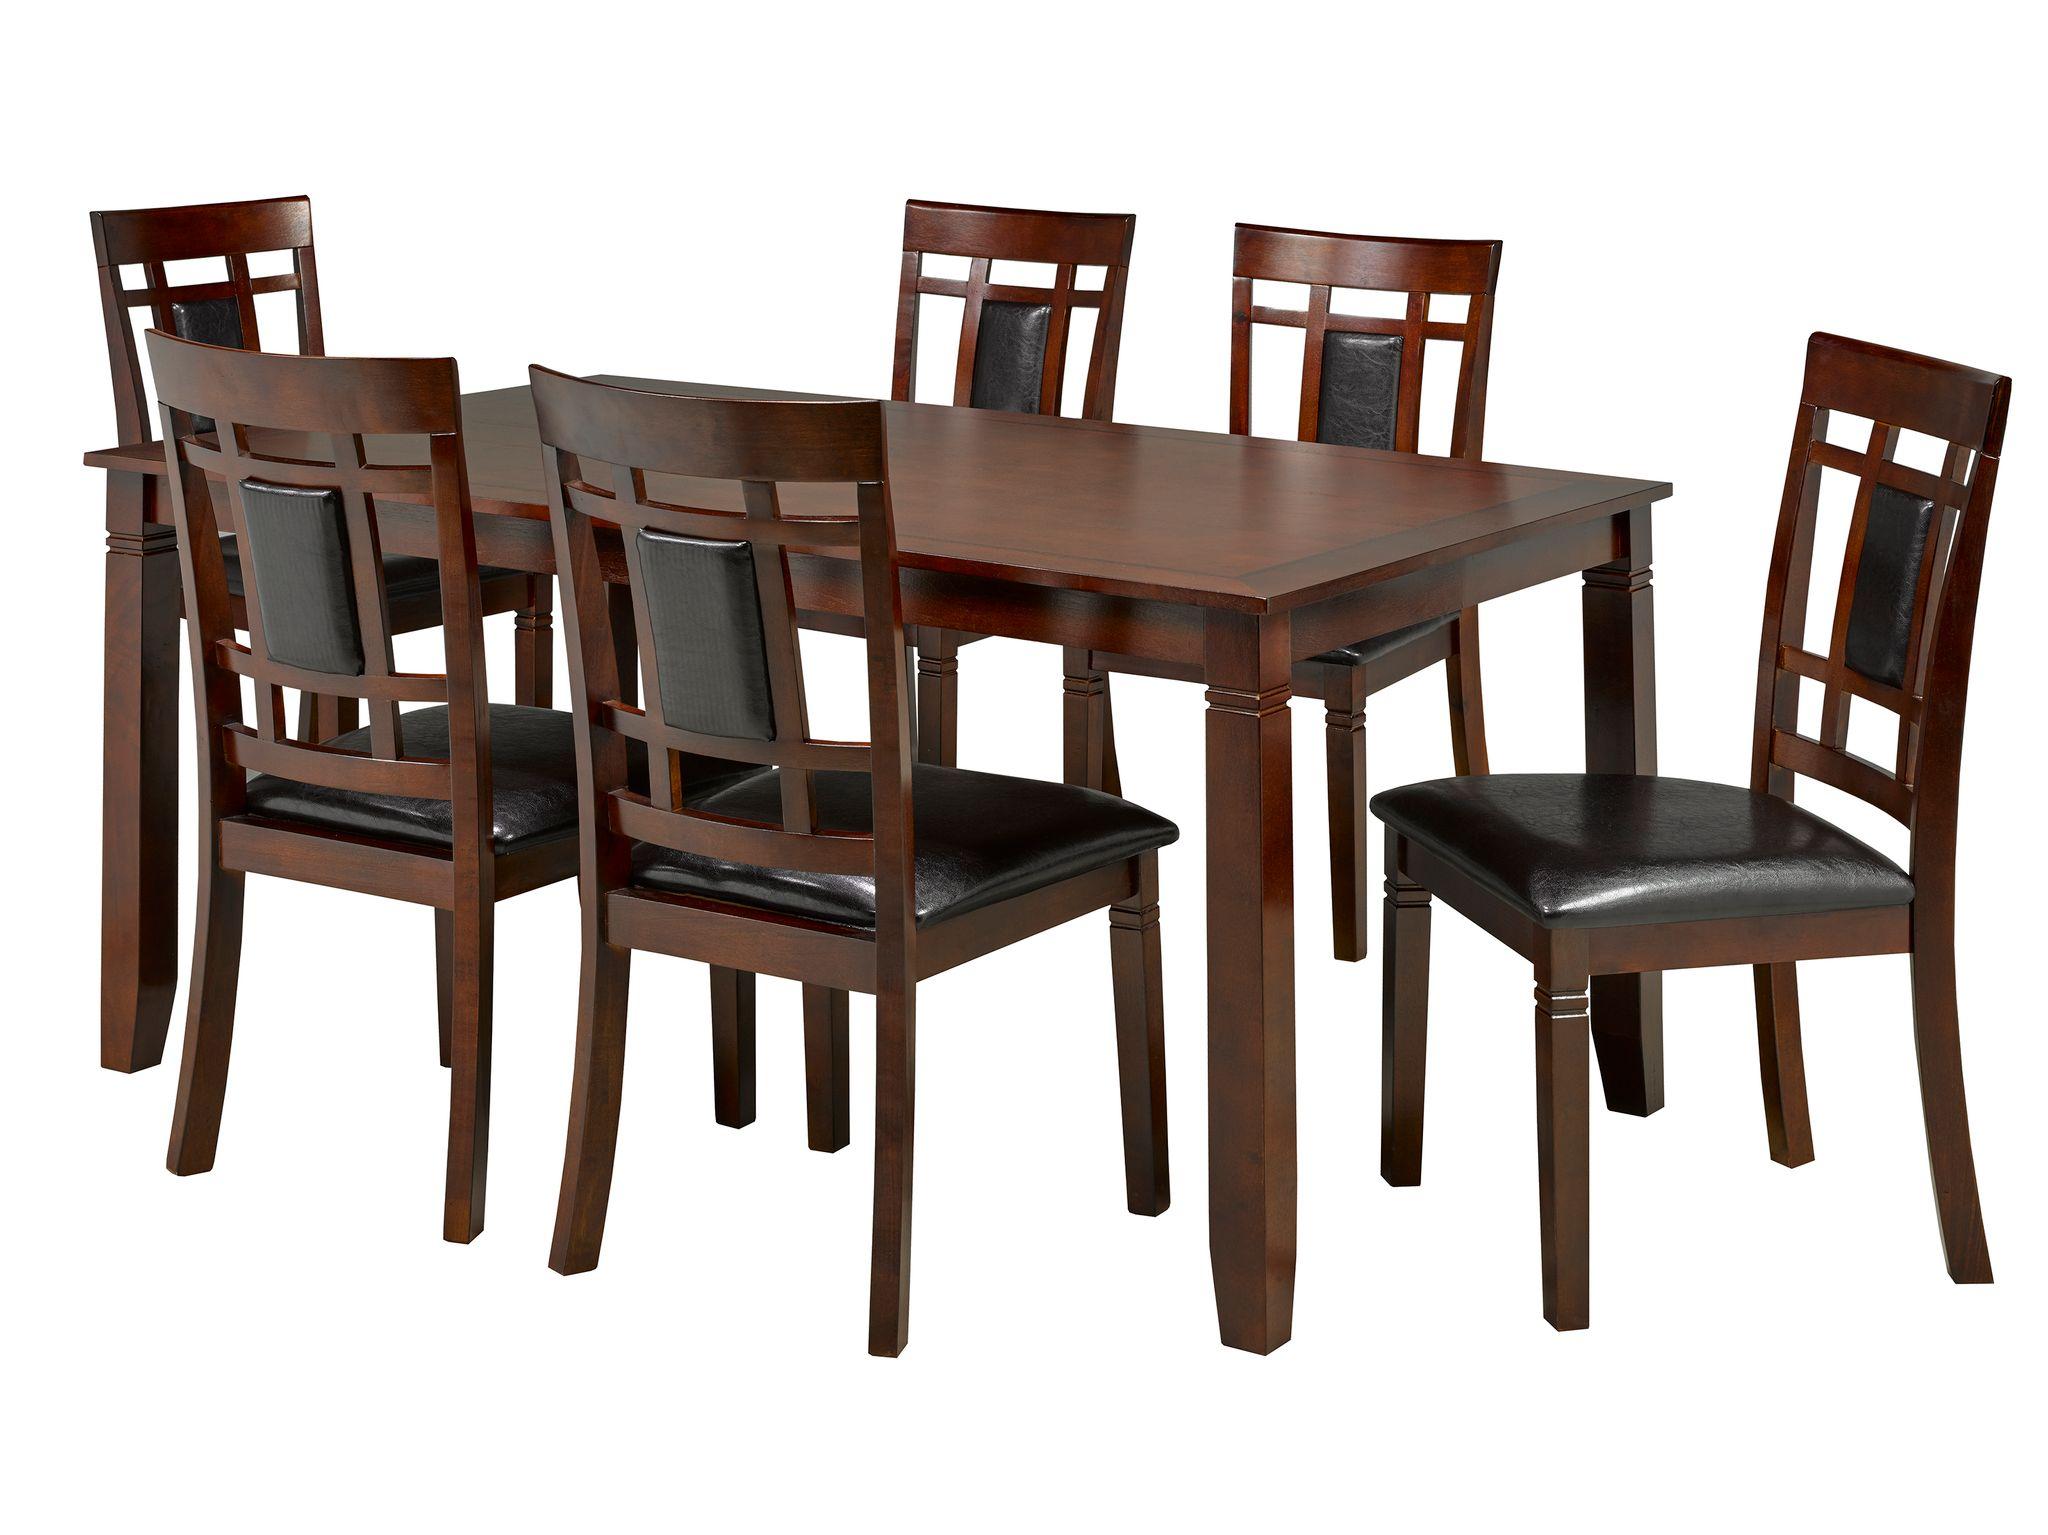 7-PIECE DINING TABLE SET - ESPRESSO